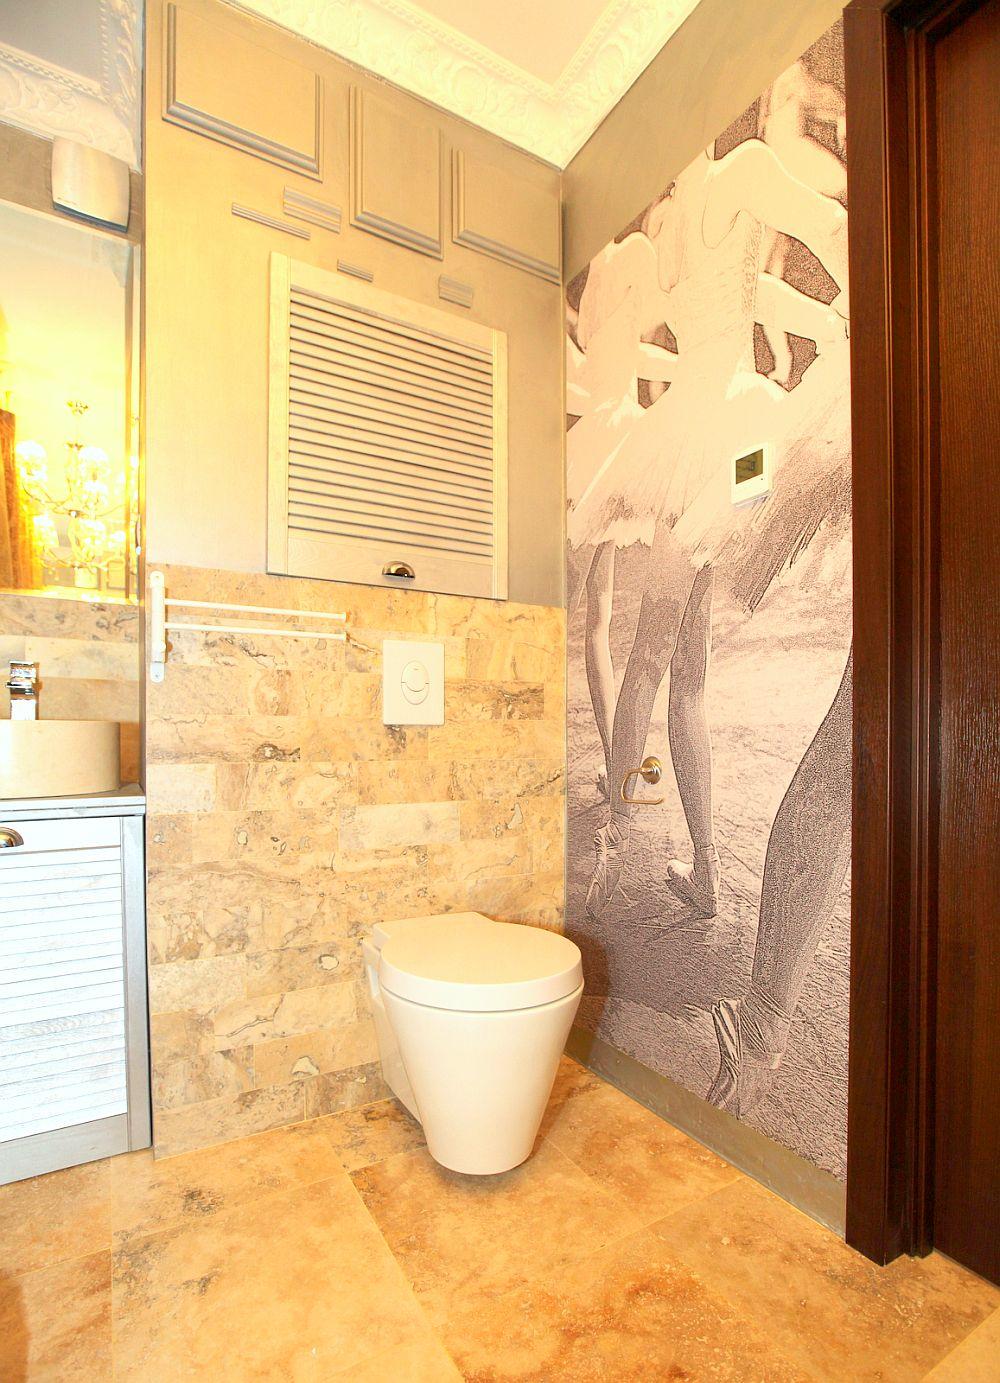 adelaparvu.com despre apartament 3 camere Bucuresti, designer Tanya Solomitchi (9)